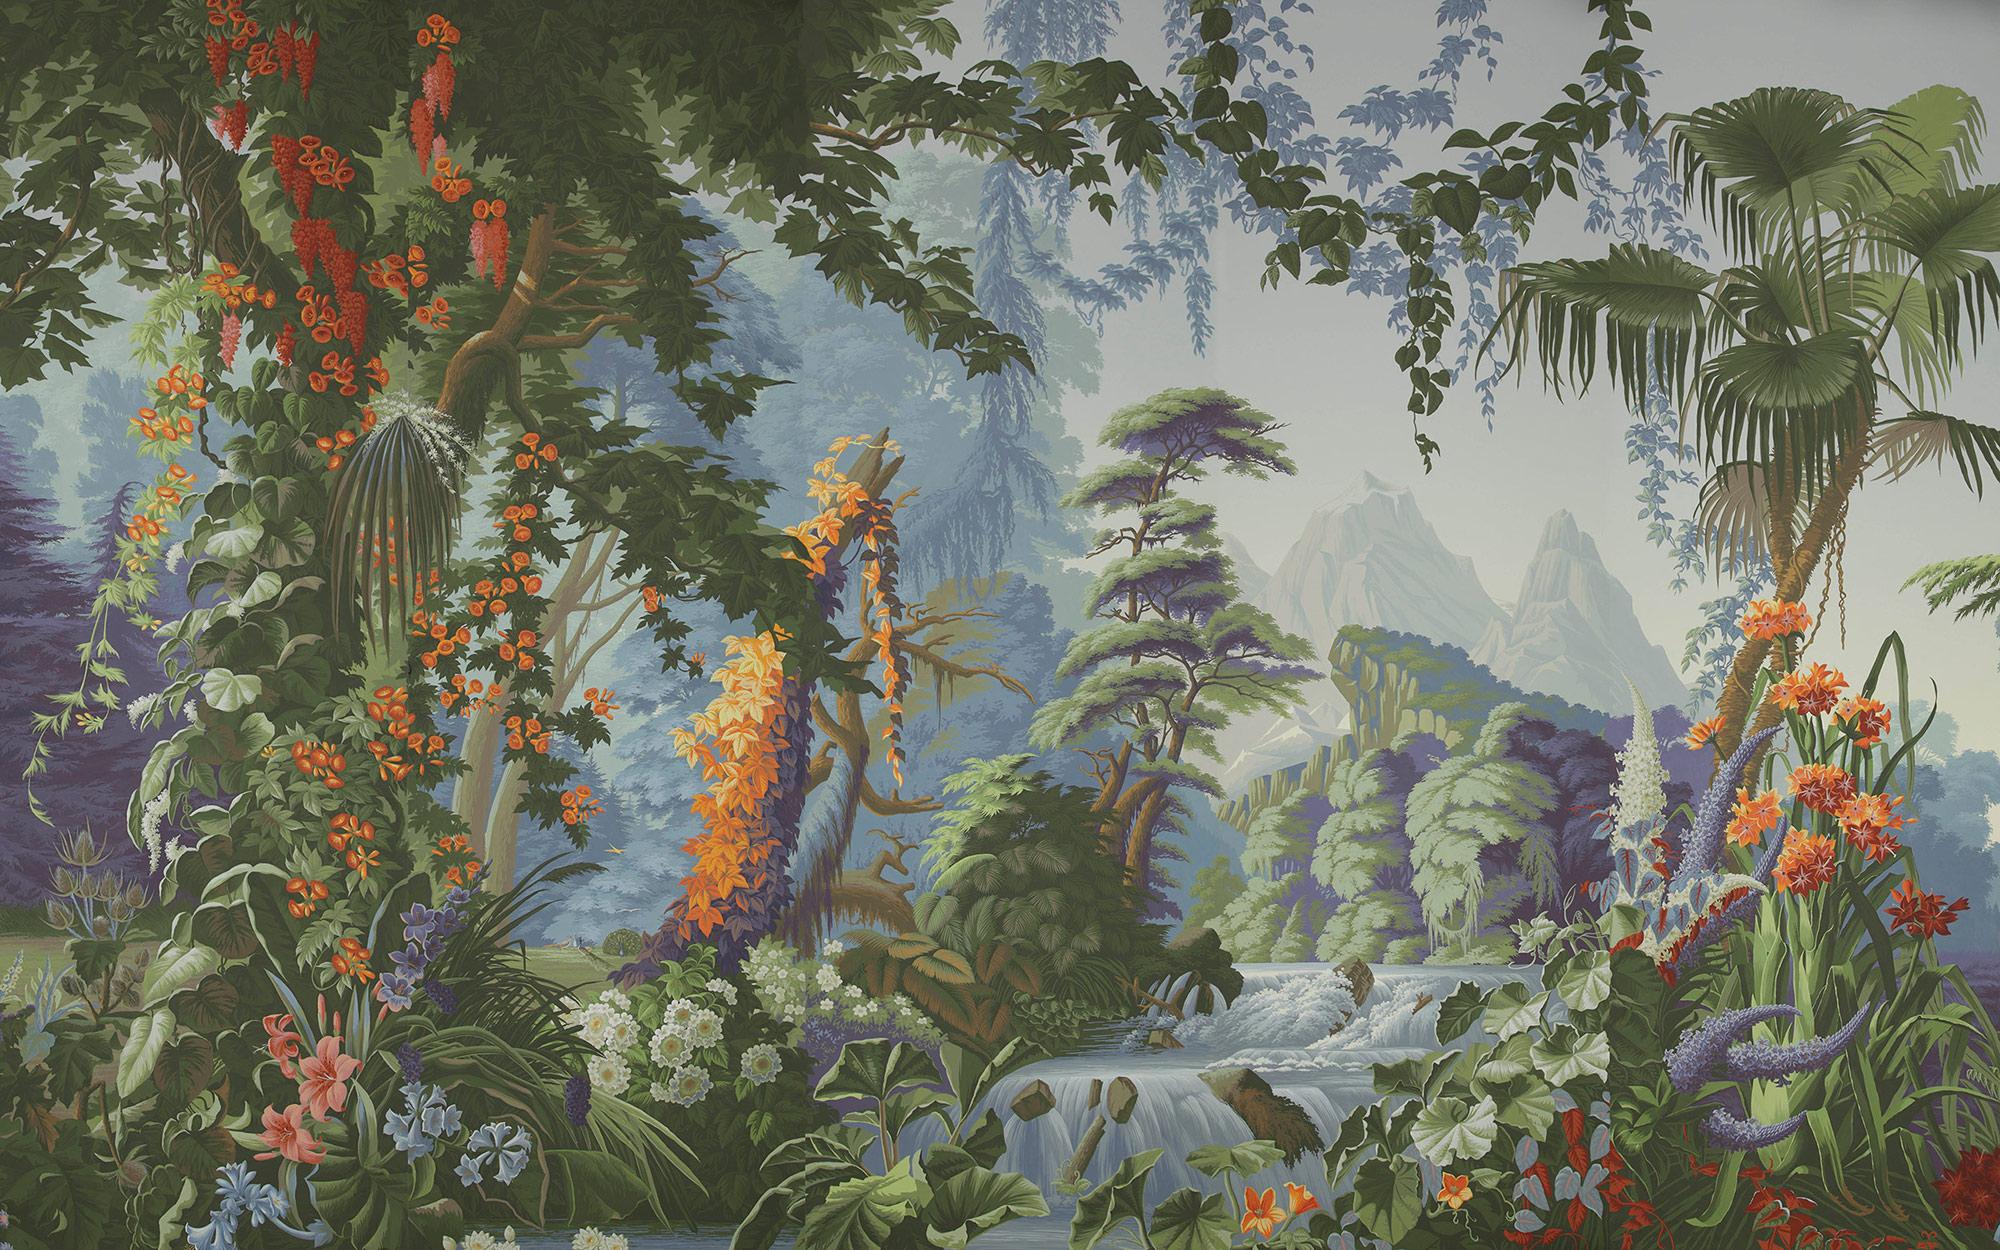 Eden on scenic paper